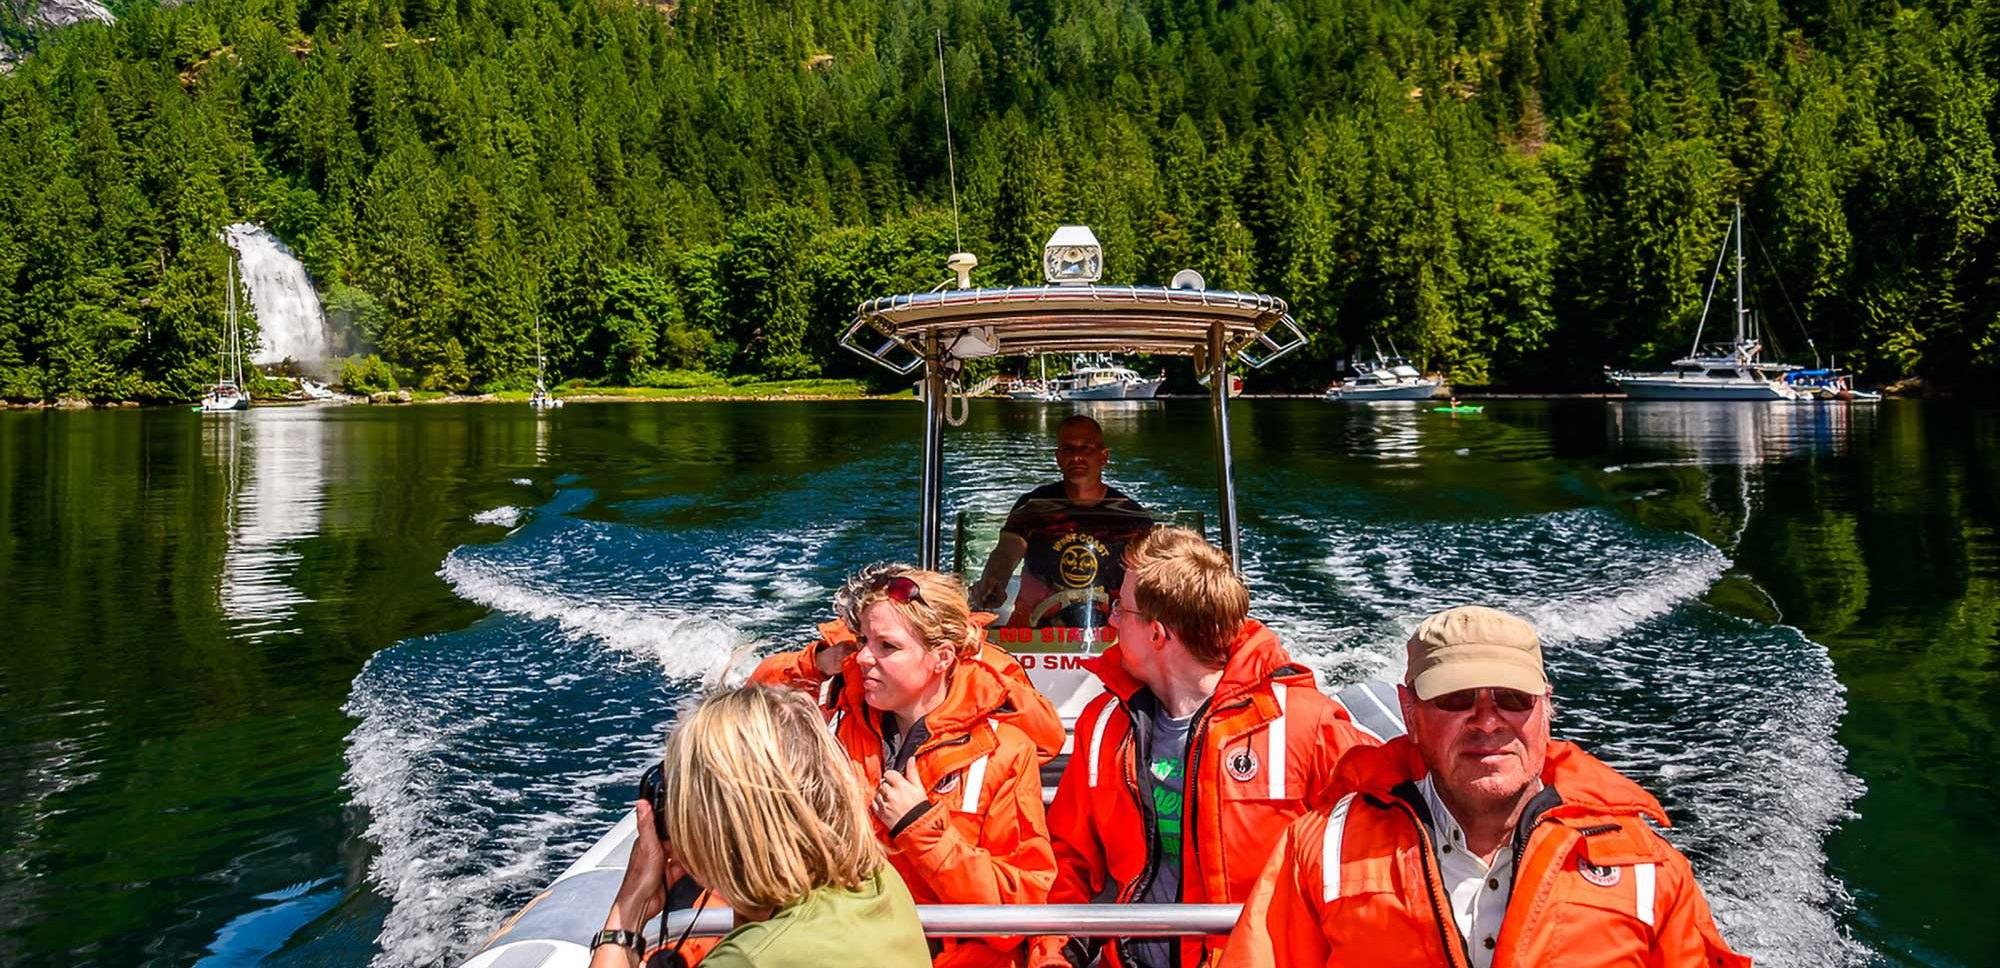 helicopter-flight-no-limit-adventure-boat-excursion